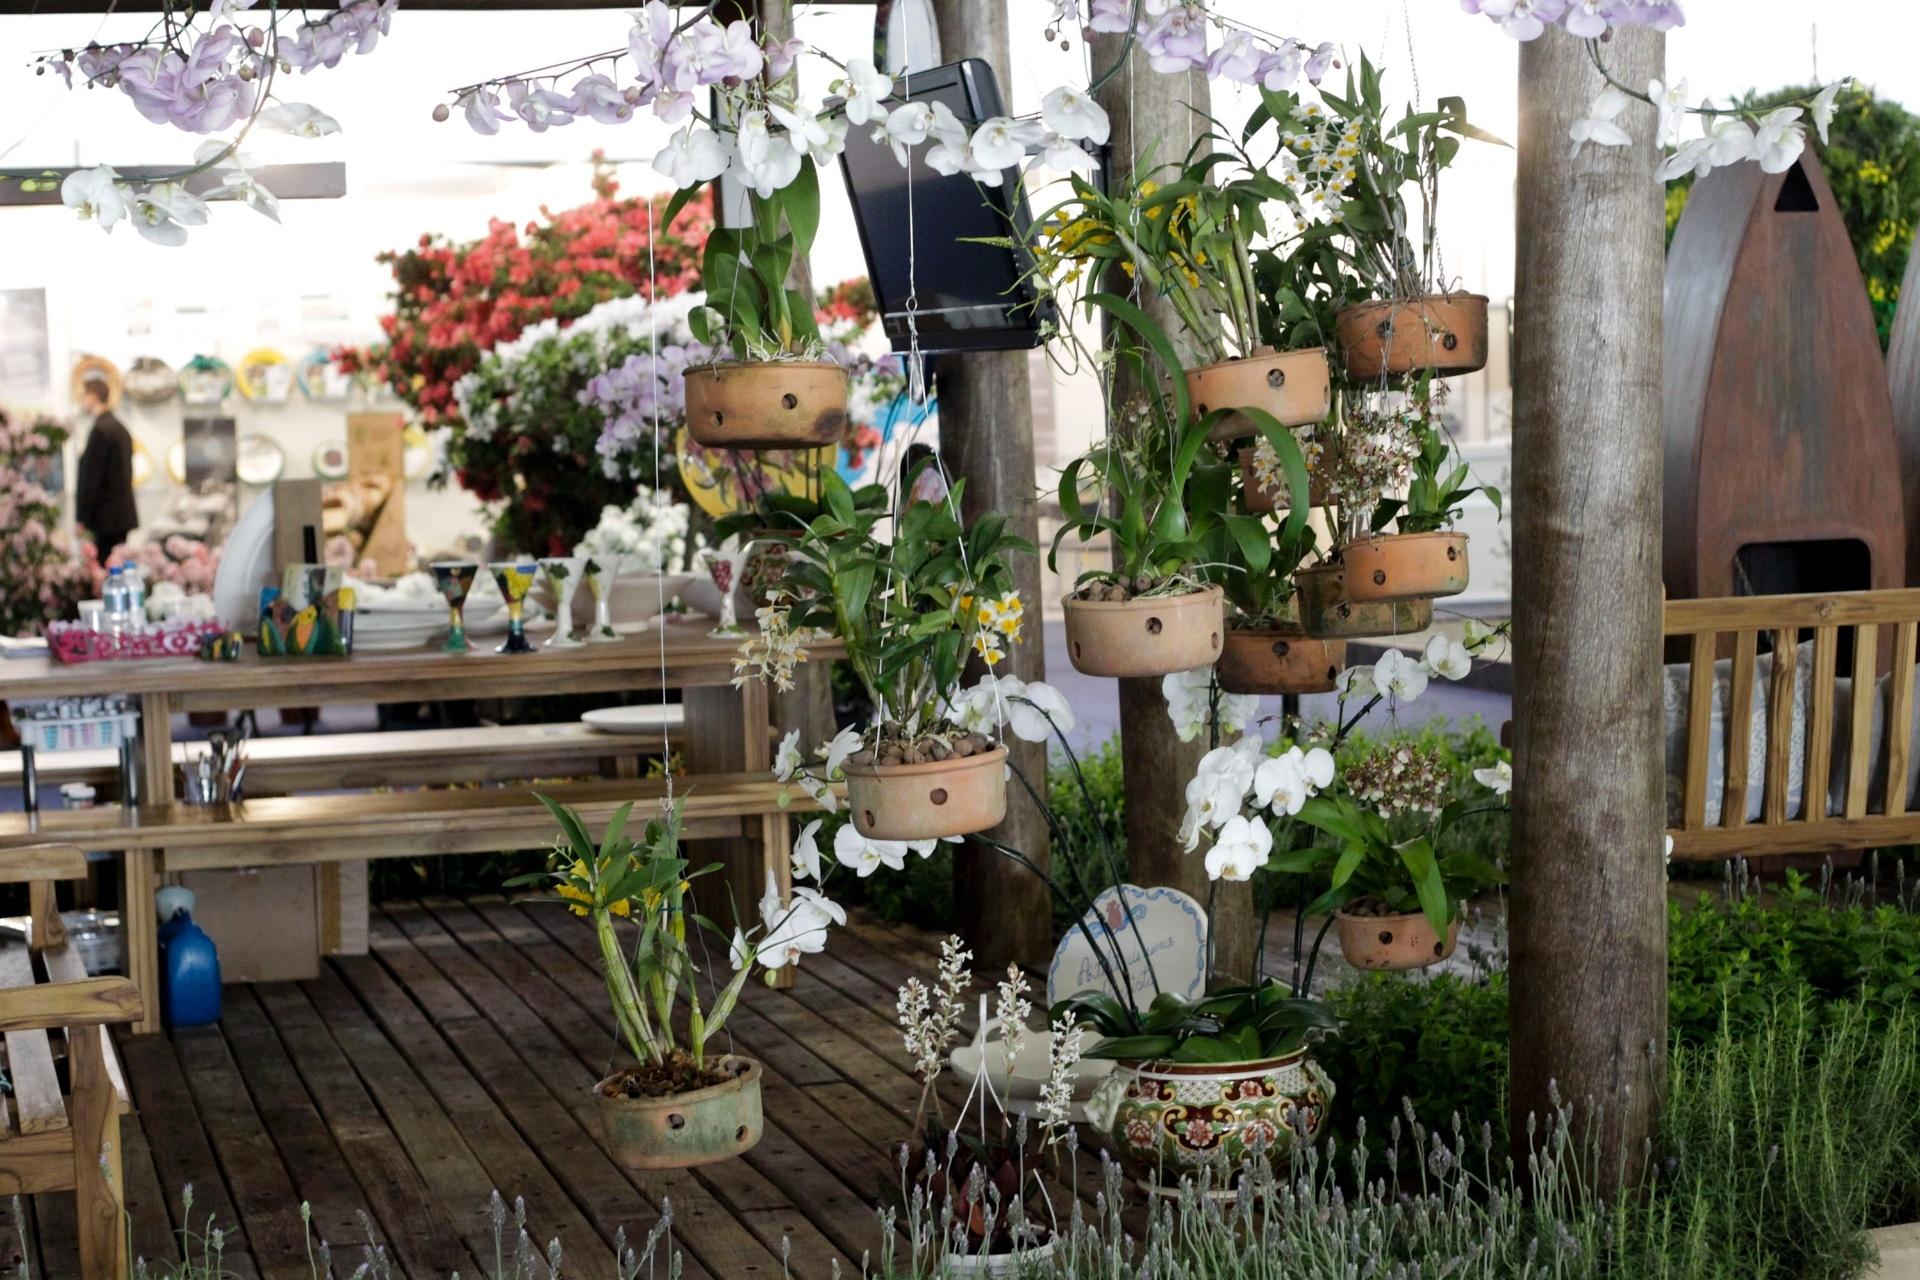 Na entrada, as orquídeas de espécies variadas compõem o